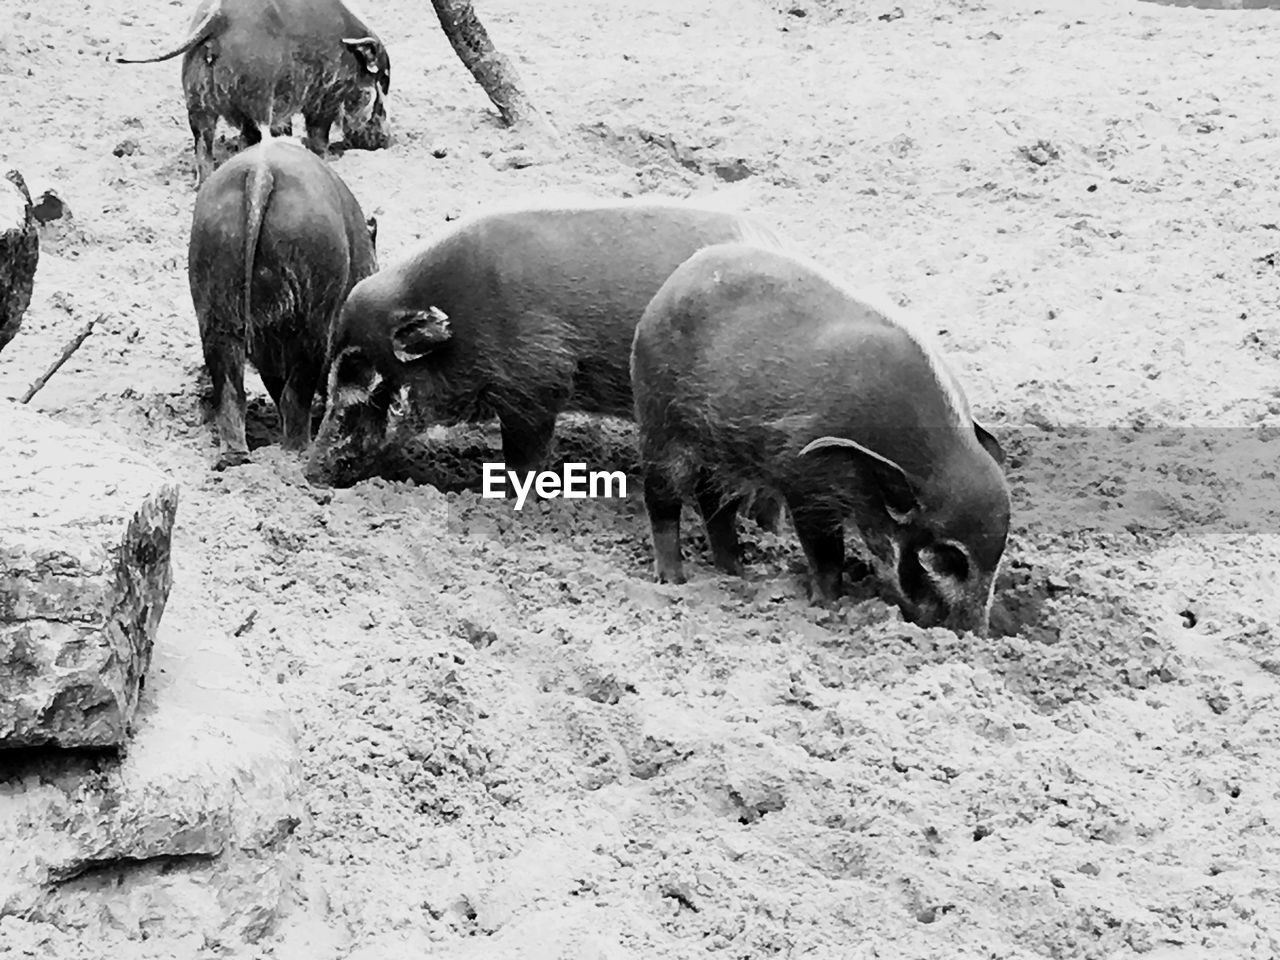 animal themes, animal, group of animals, mammal, vertebrate, animal wildlife, animals in the wild, pig, land, young animal, day, no people, nature, domestic animals, livestock, three animals, animal family, rock, field, outdoors, mud, herbivorous